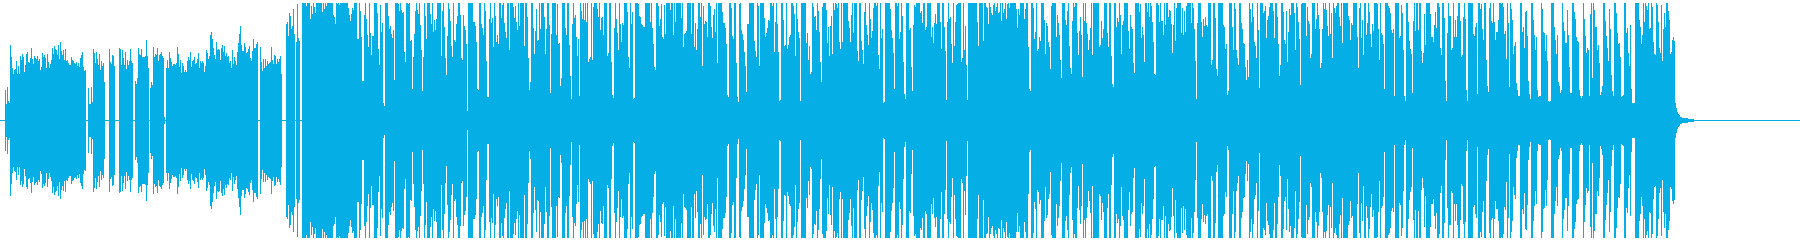 8bitチップチューン近代的テクノハウスの再生済みの波形